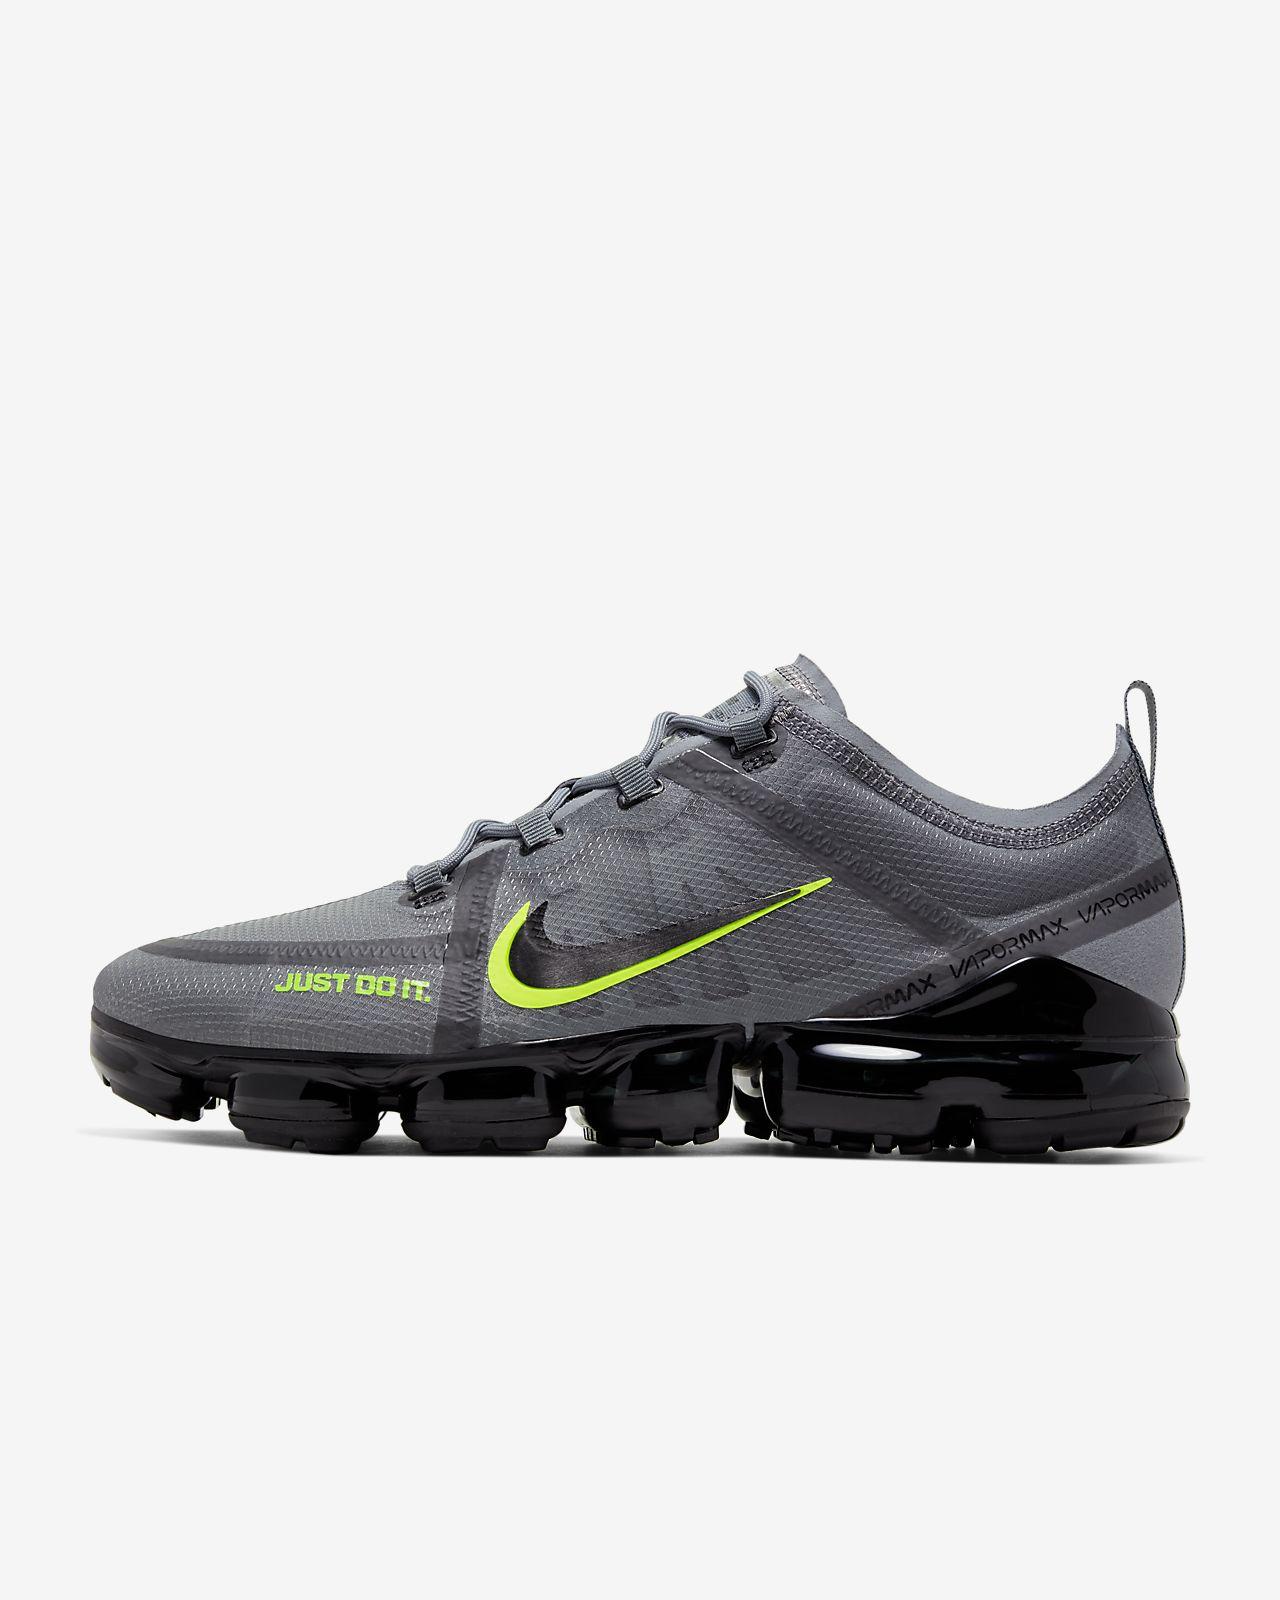 Chaussure Nike Air VaporMax 2019 DRT pour Homme